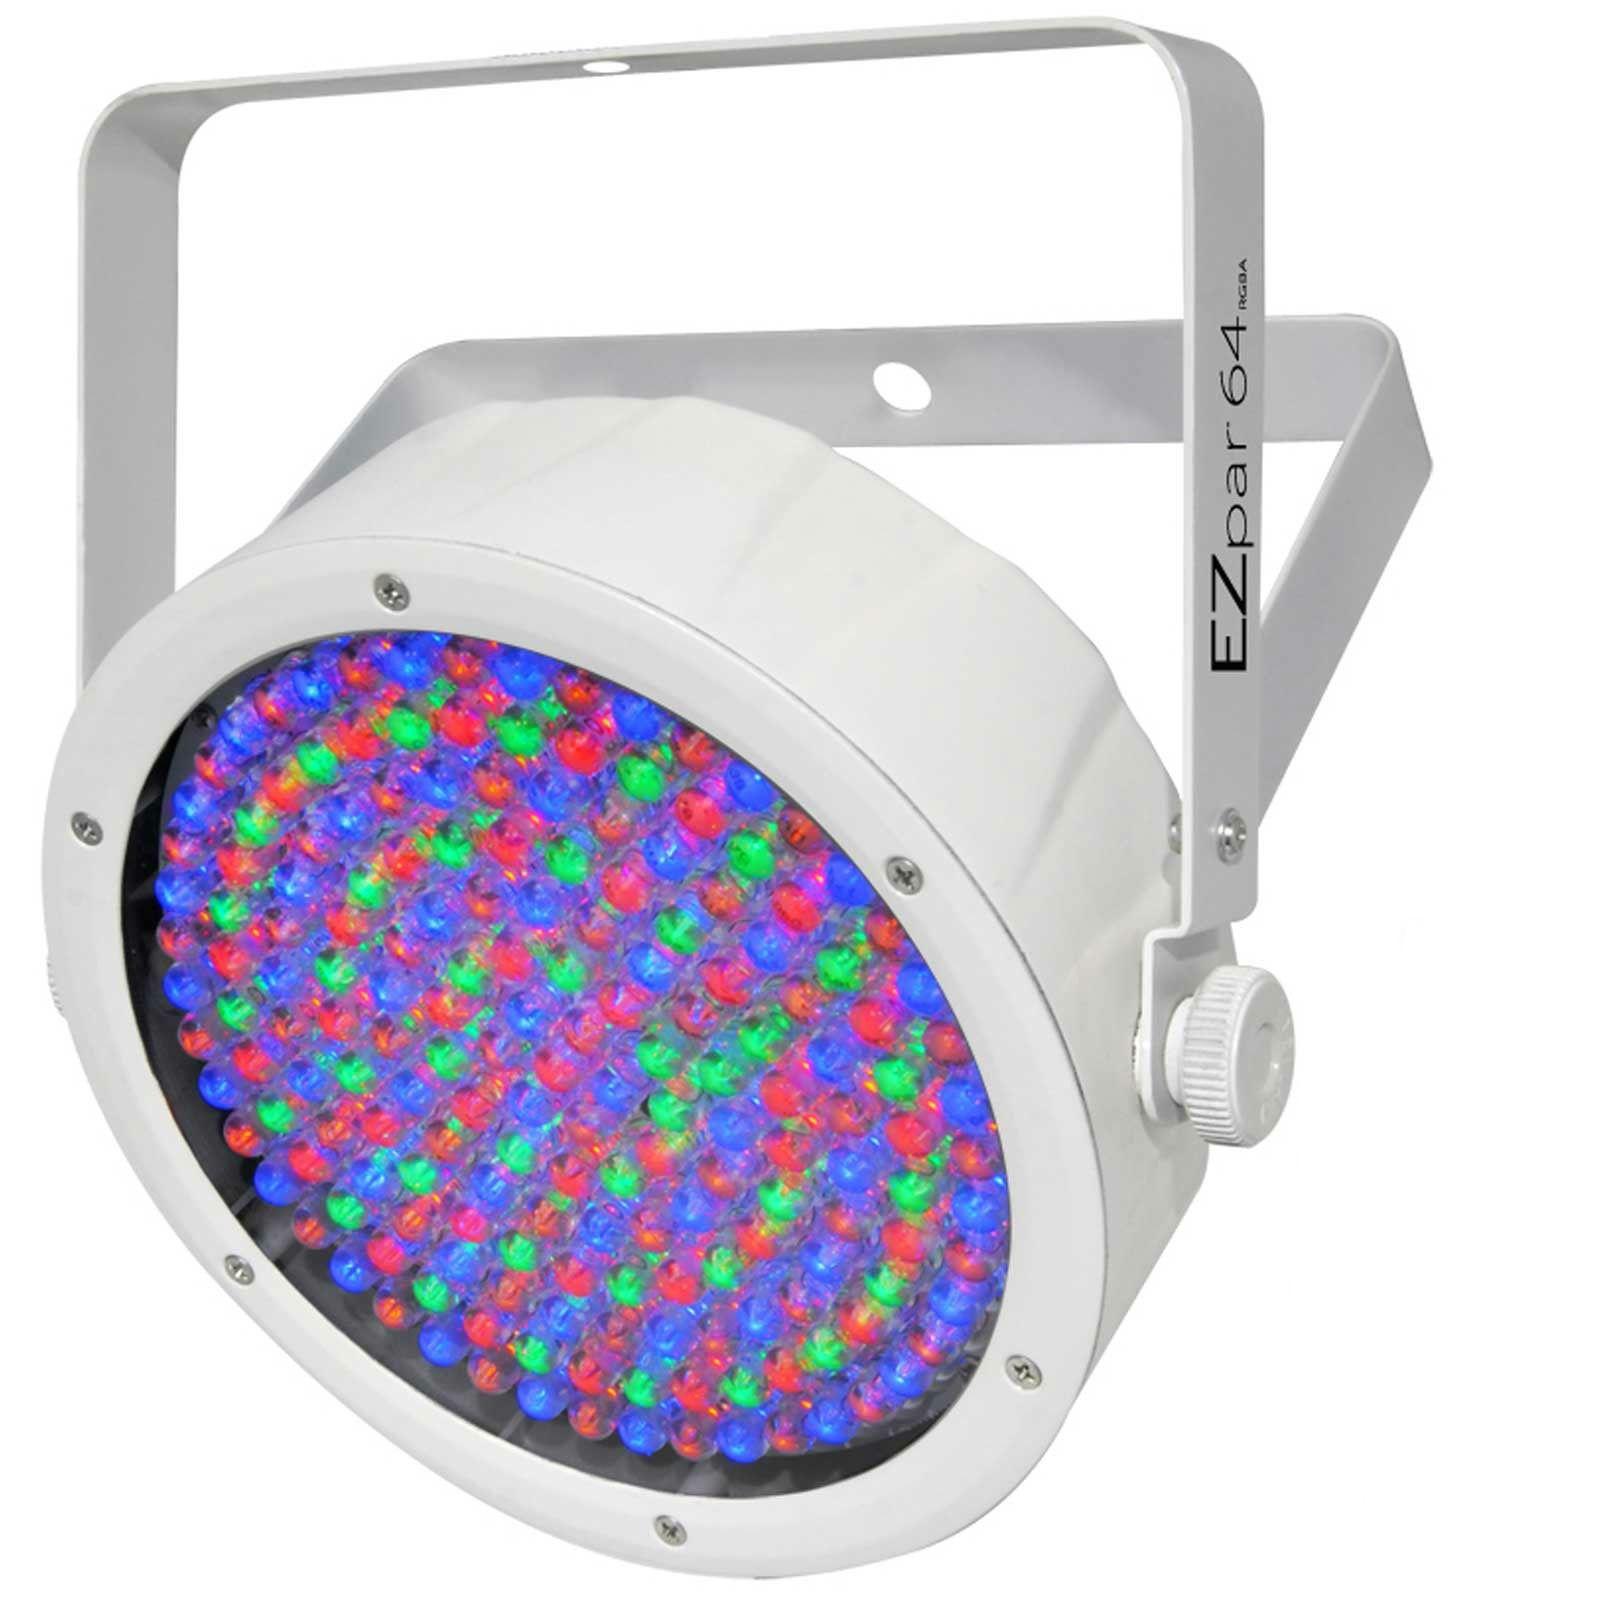 Wireless Up-Lighting